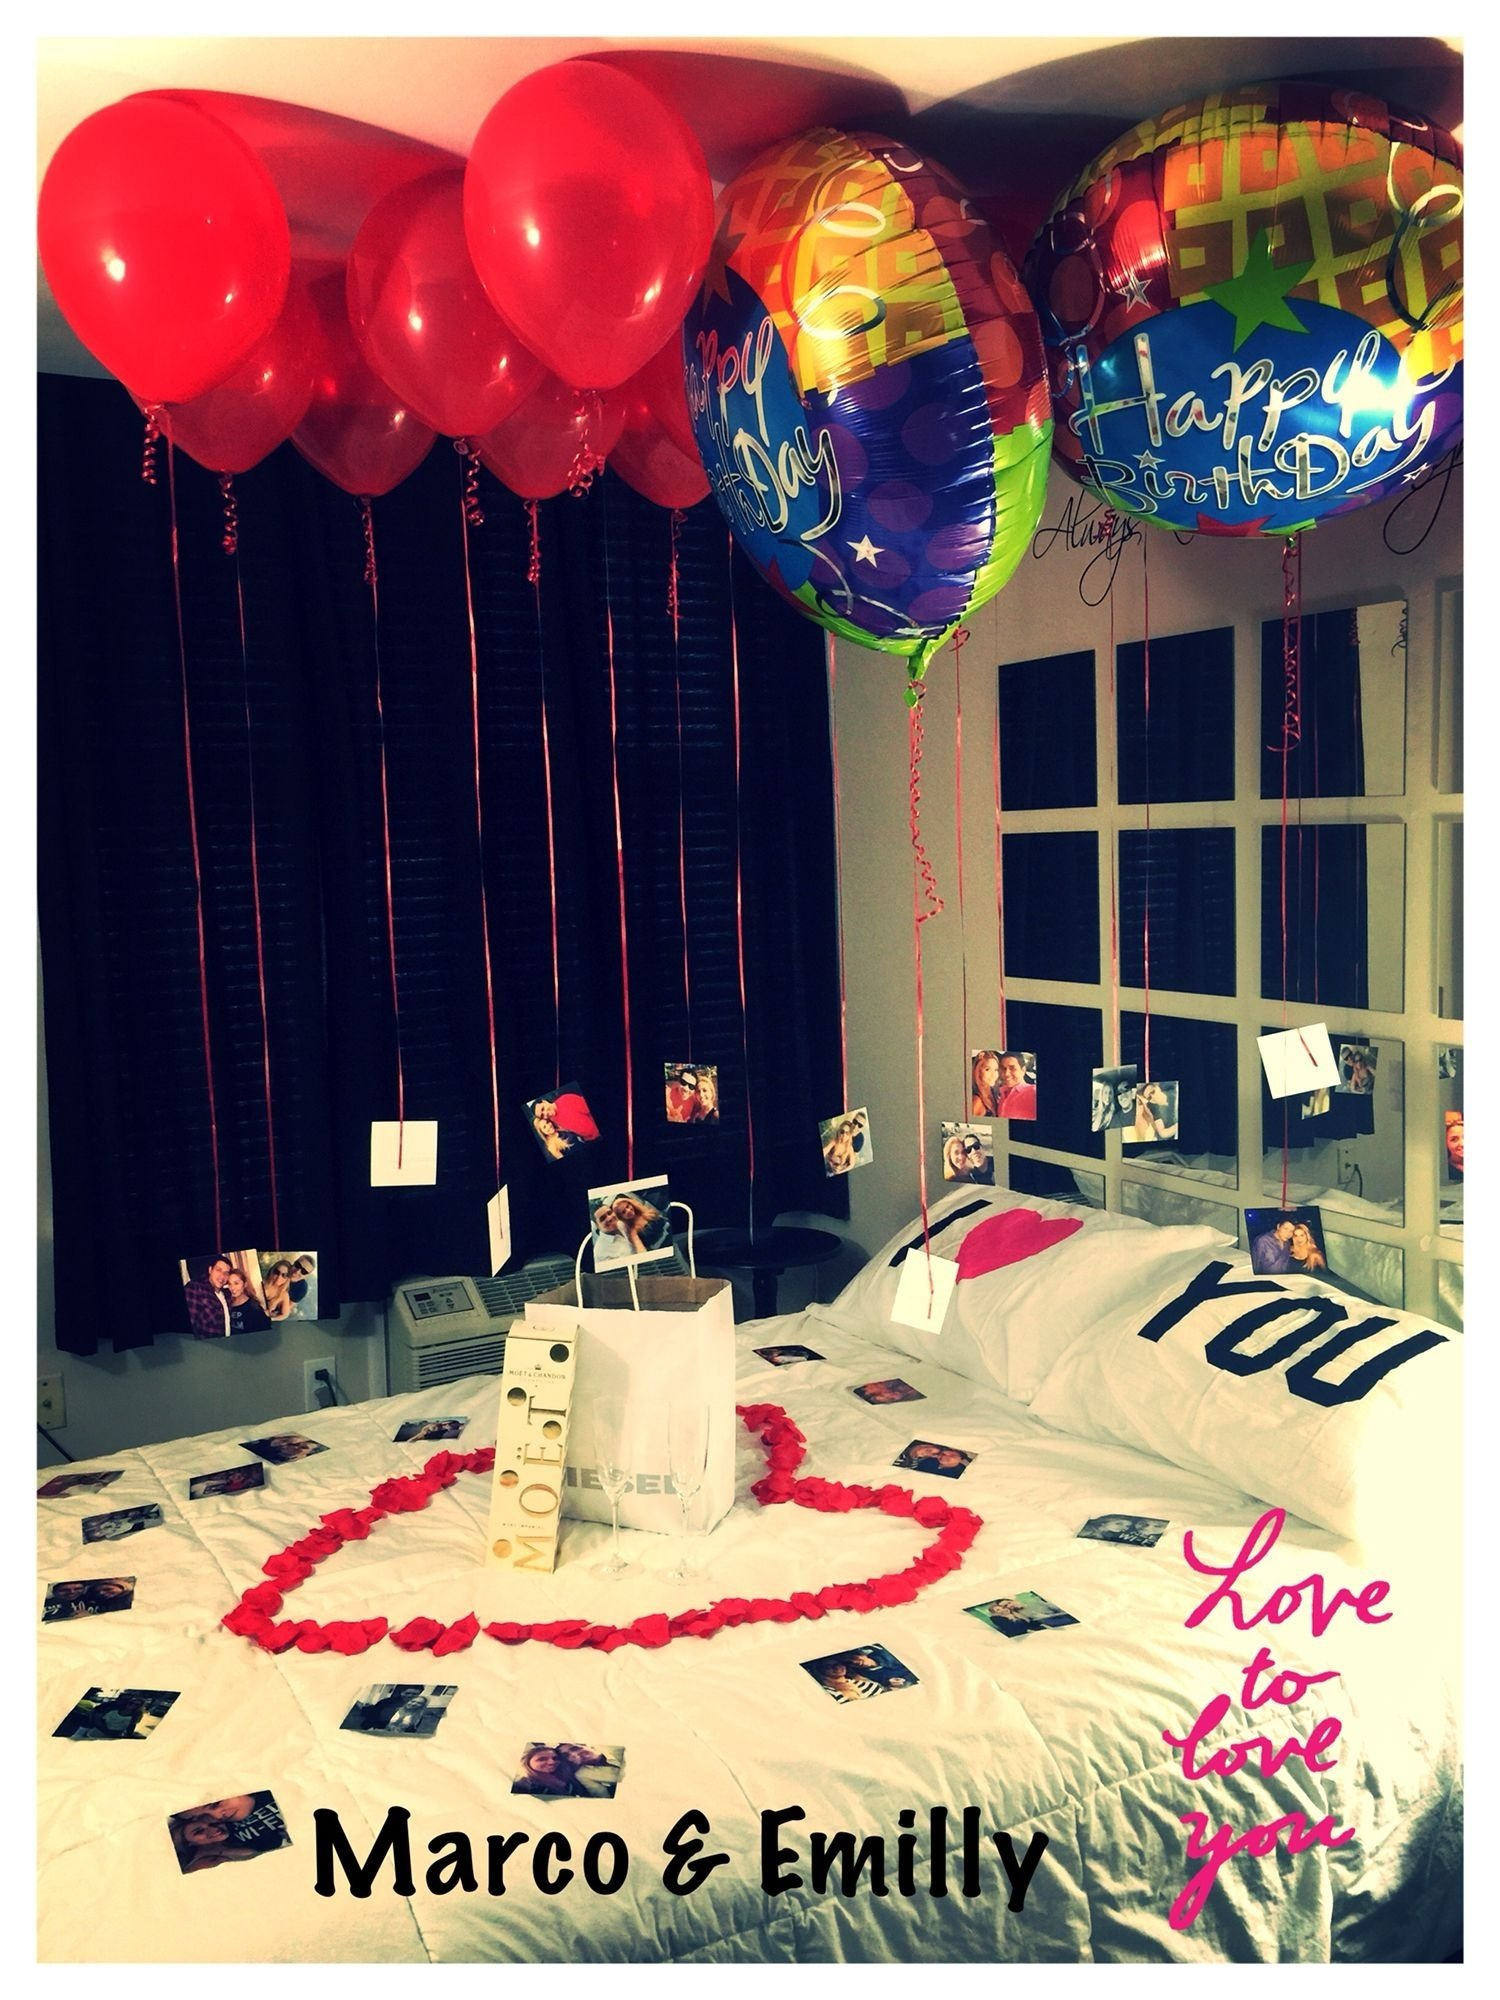 birthday surprise for my fiancé | stuff i do | pinterest | birthdays